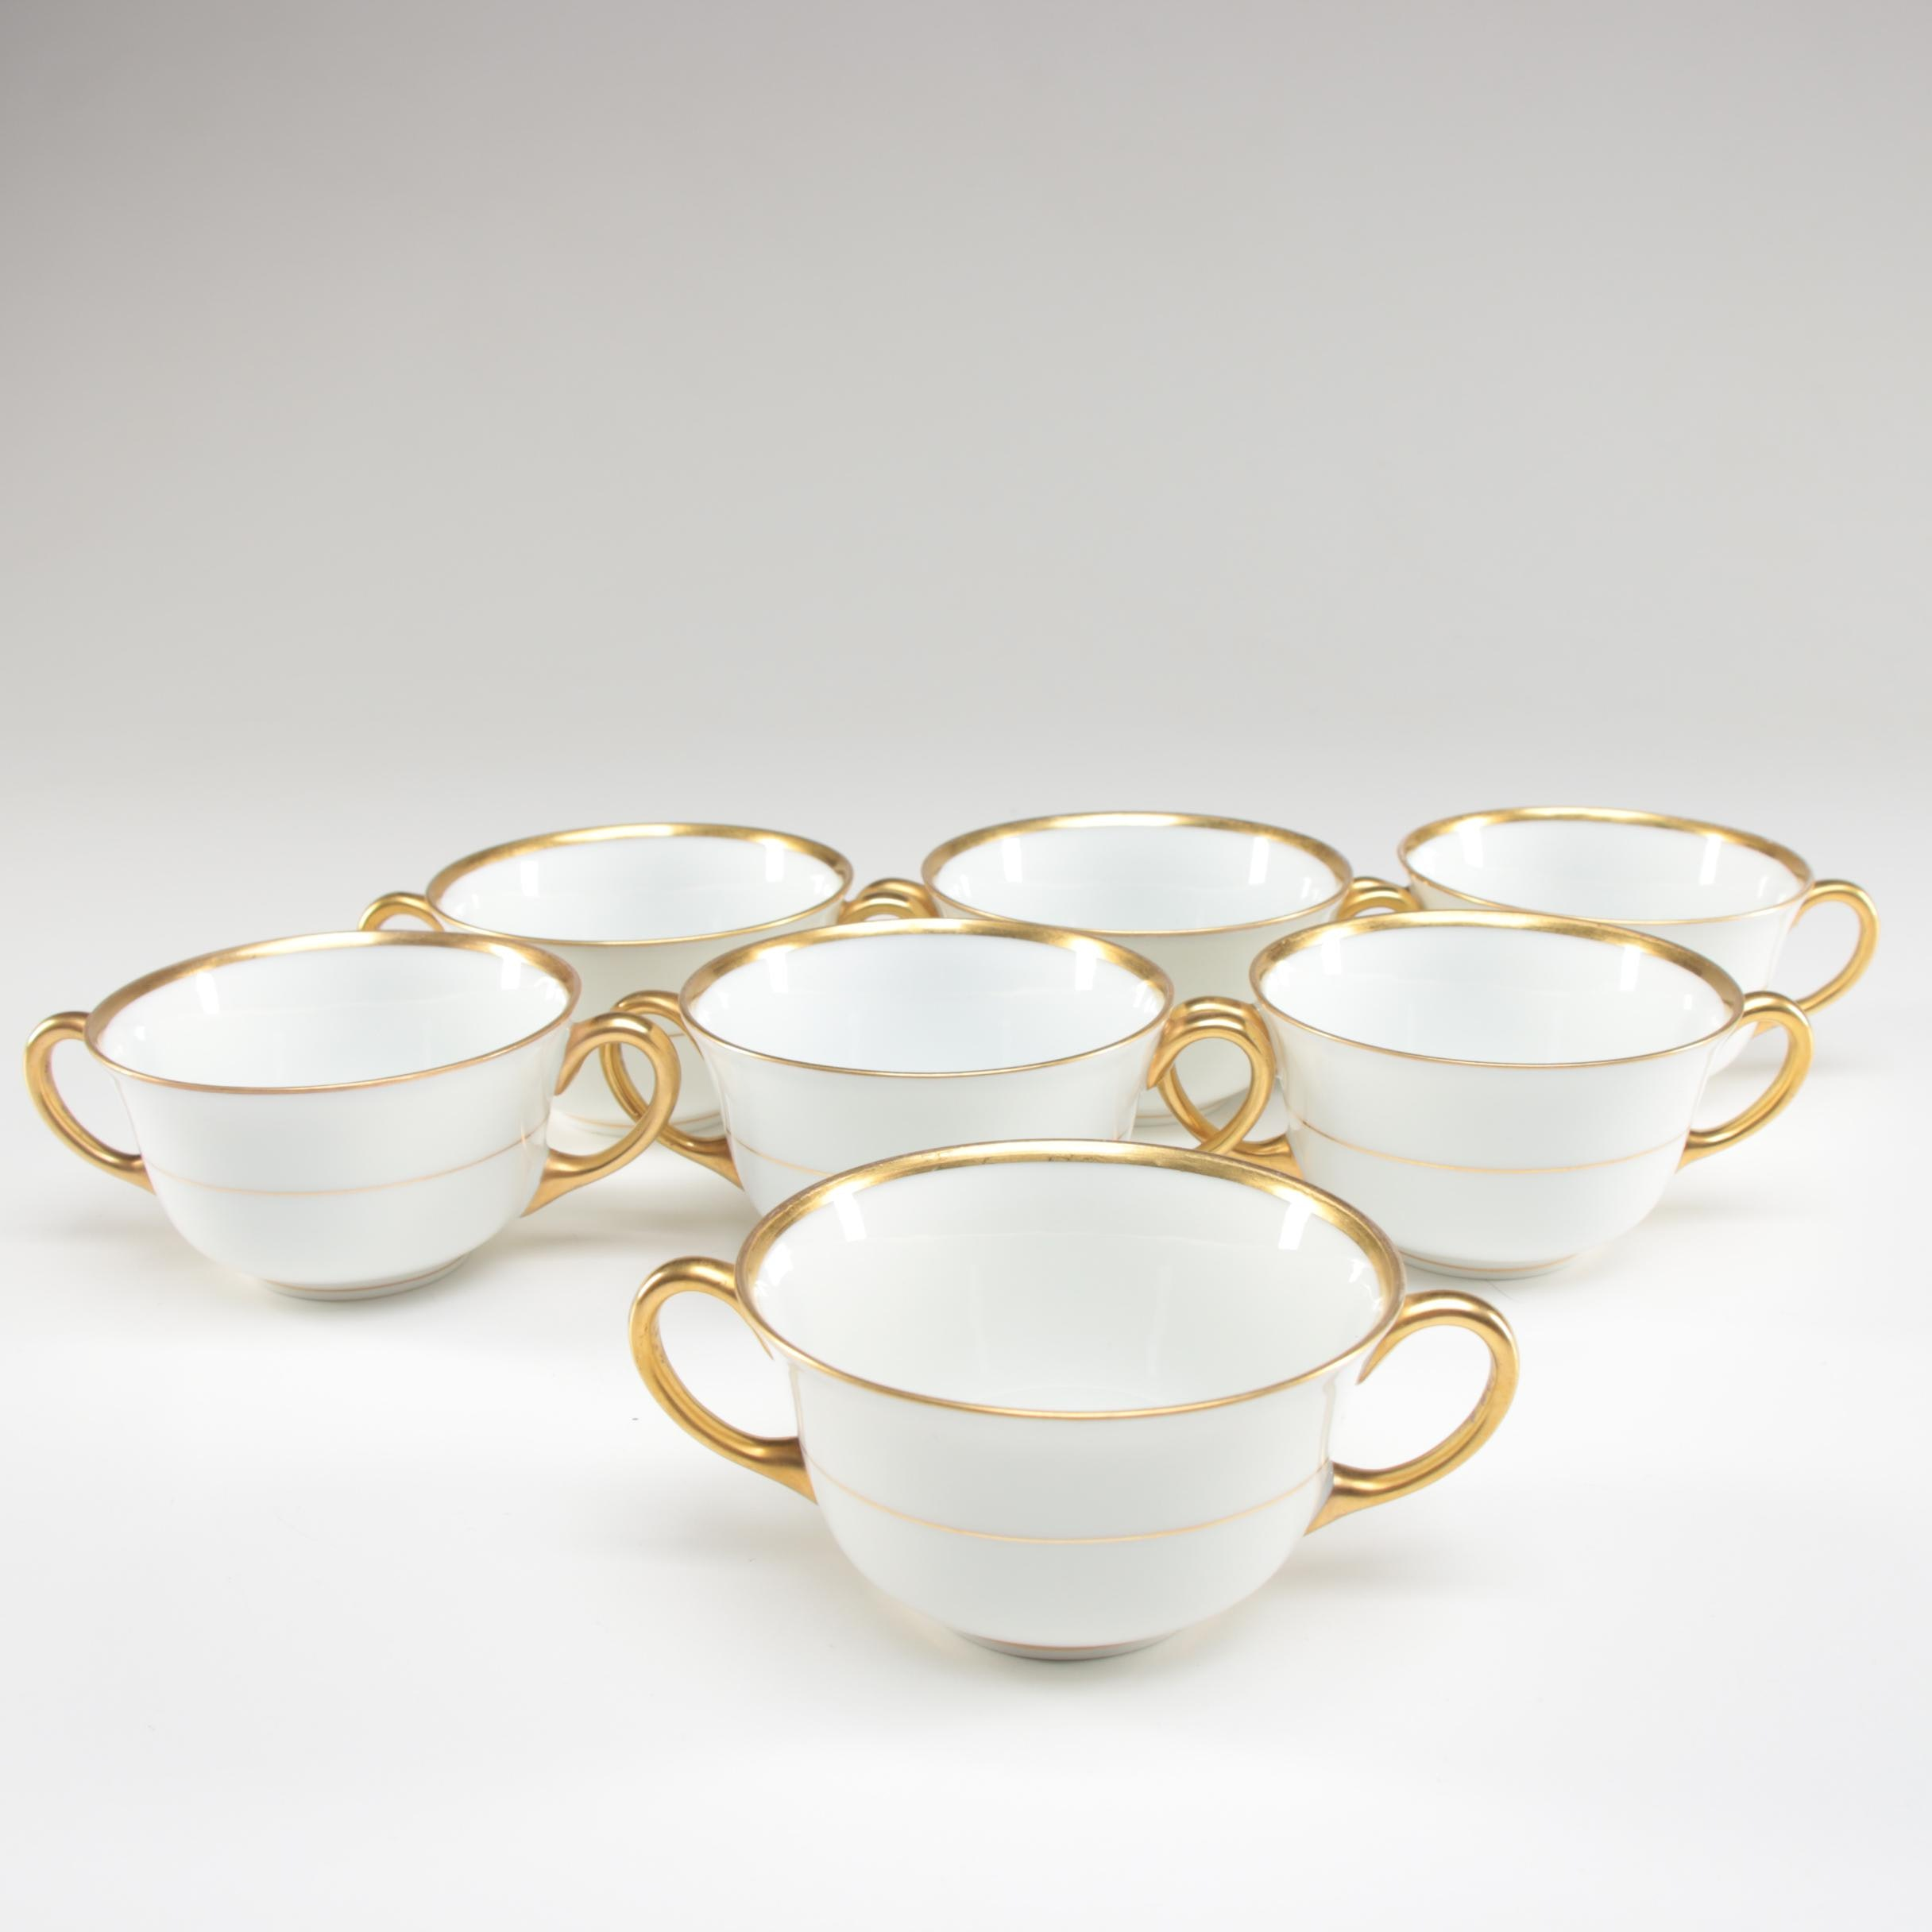 Czechoslovakian Porcelain Bouillon Cups, 1918–1993